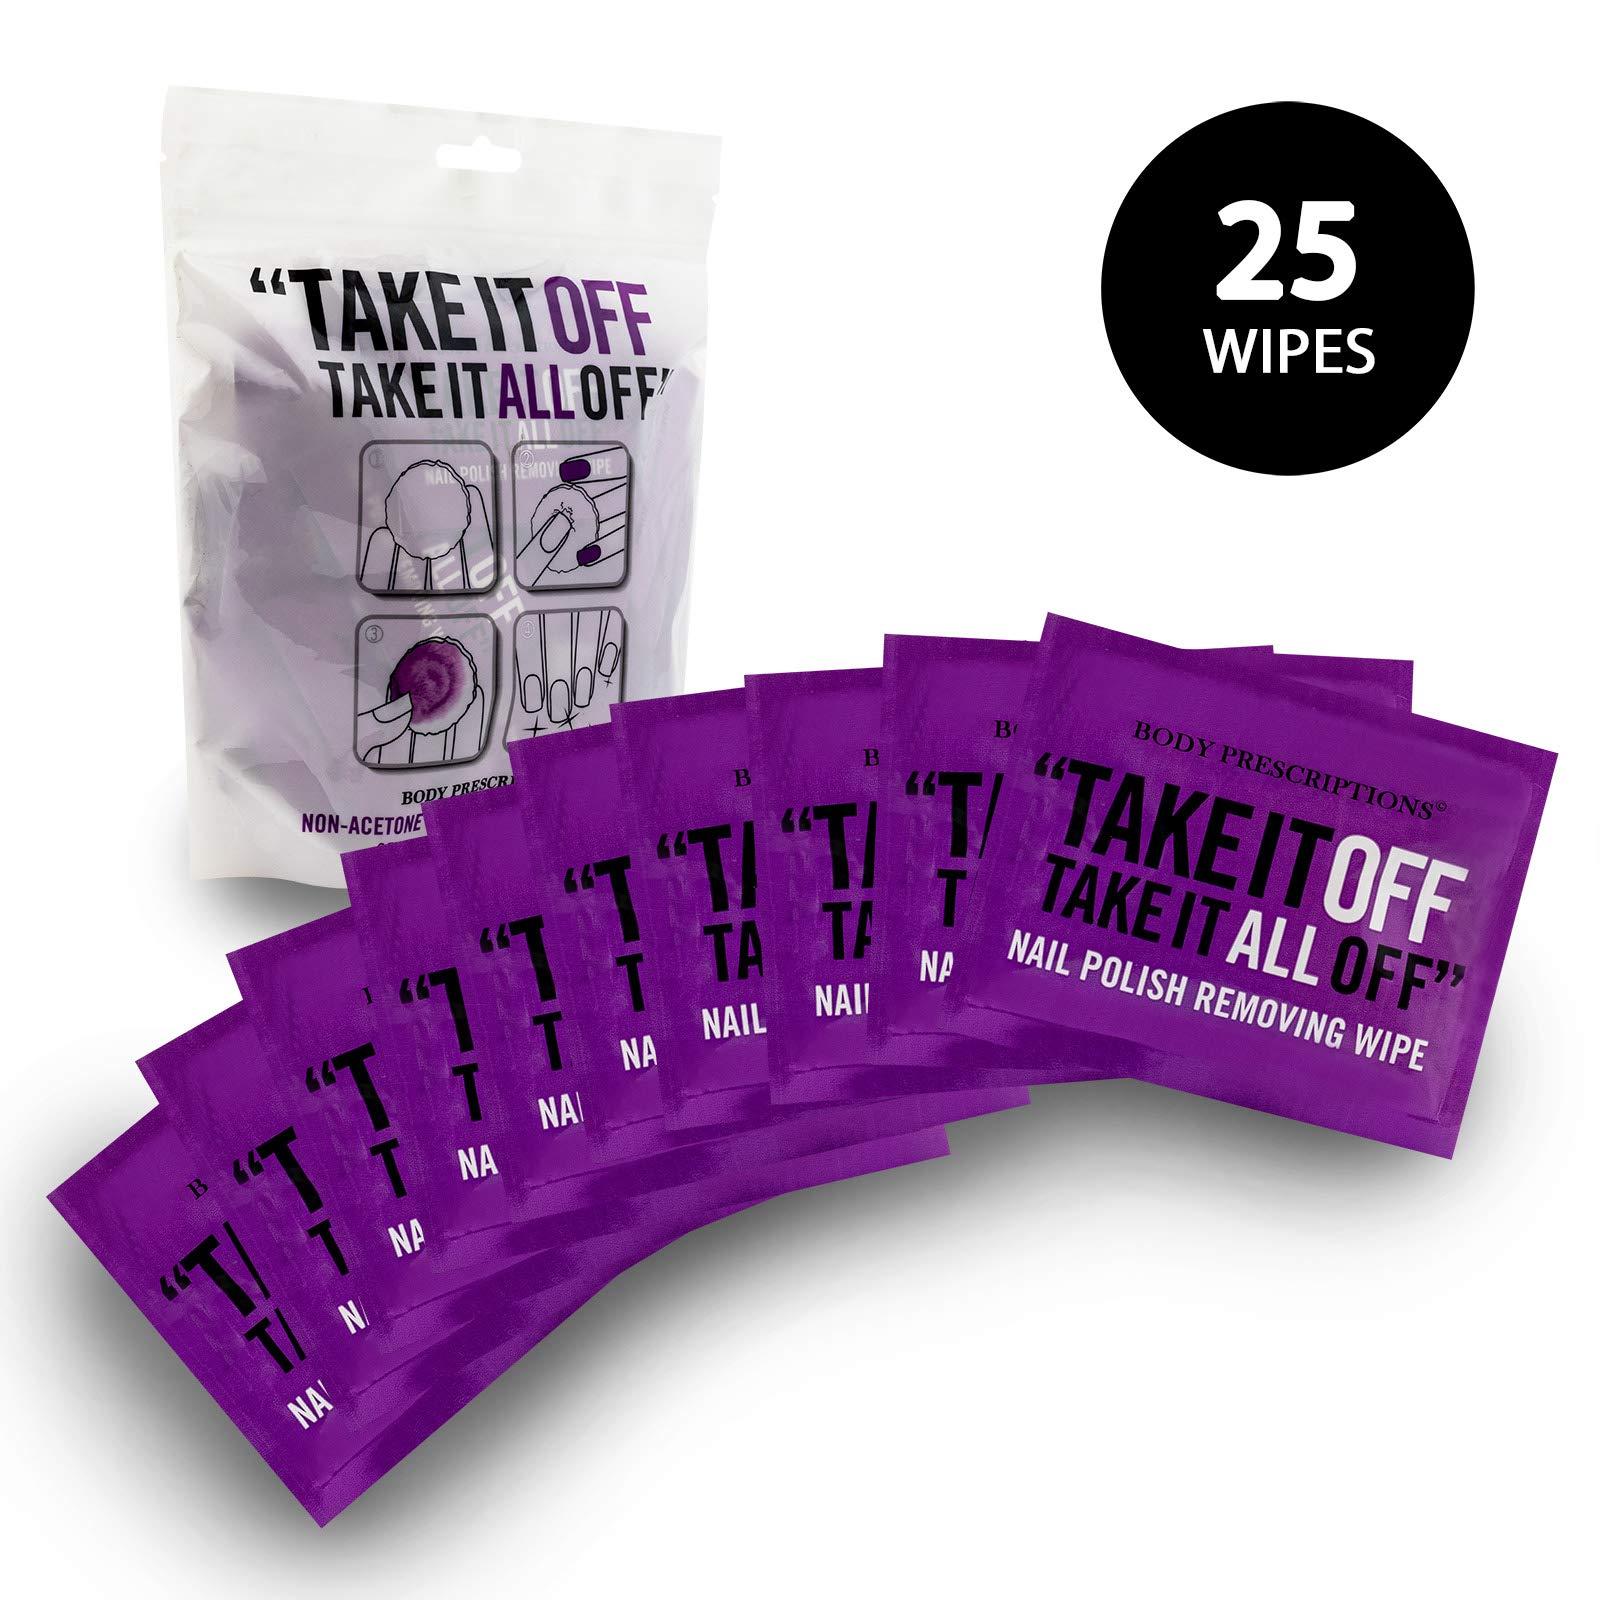 Body Prescriptions - 25 Non-Acetone Nail Polish Removing Wipes - individually wrapped by Body Prescriptions